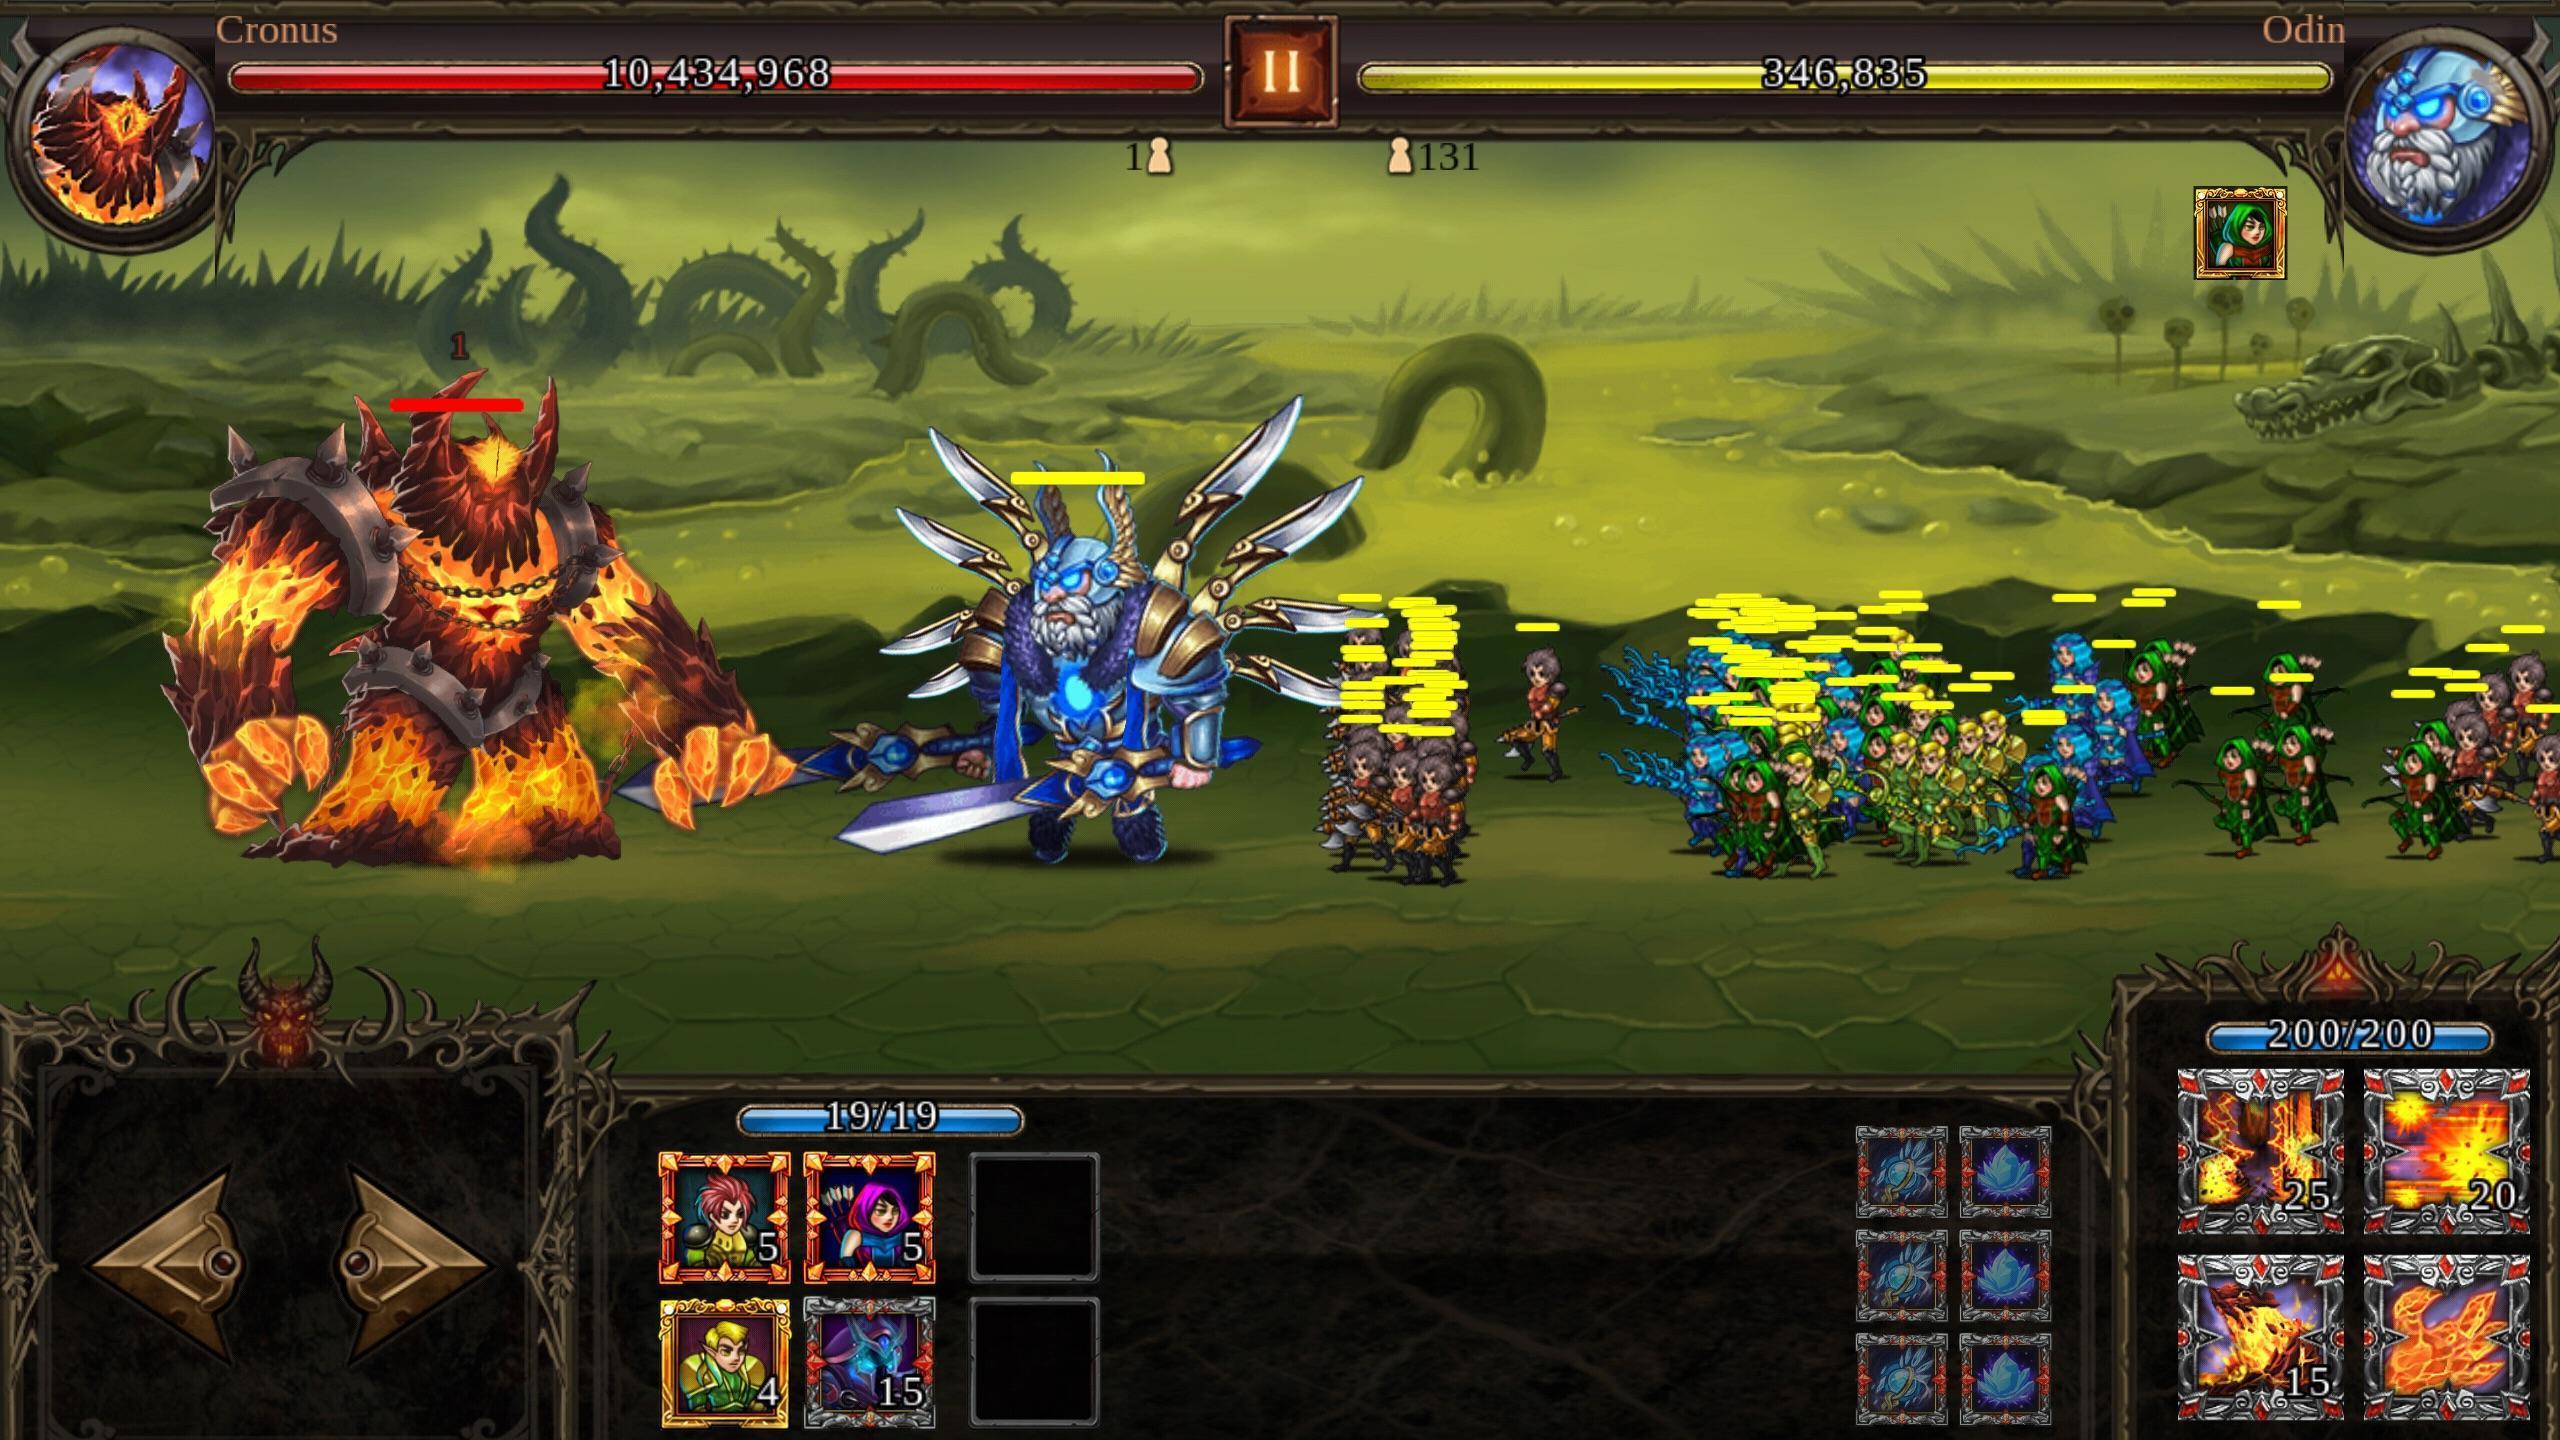 Epic Heroes War - MOVAstore.com